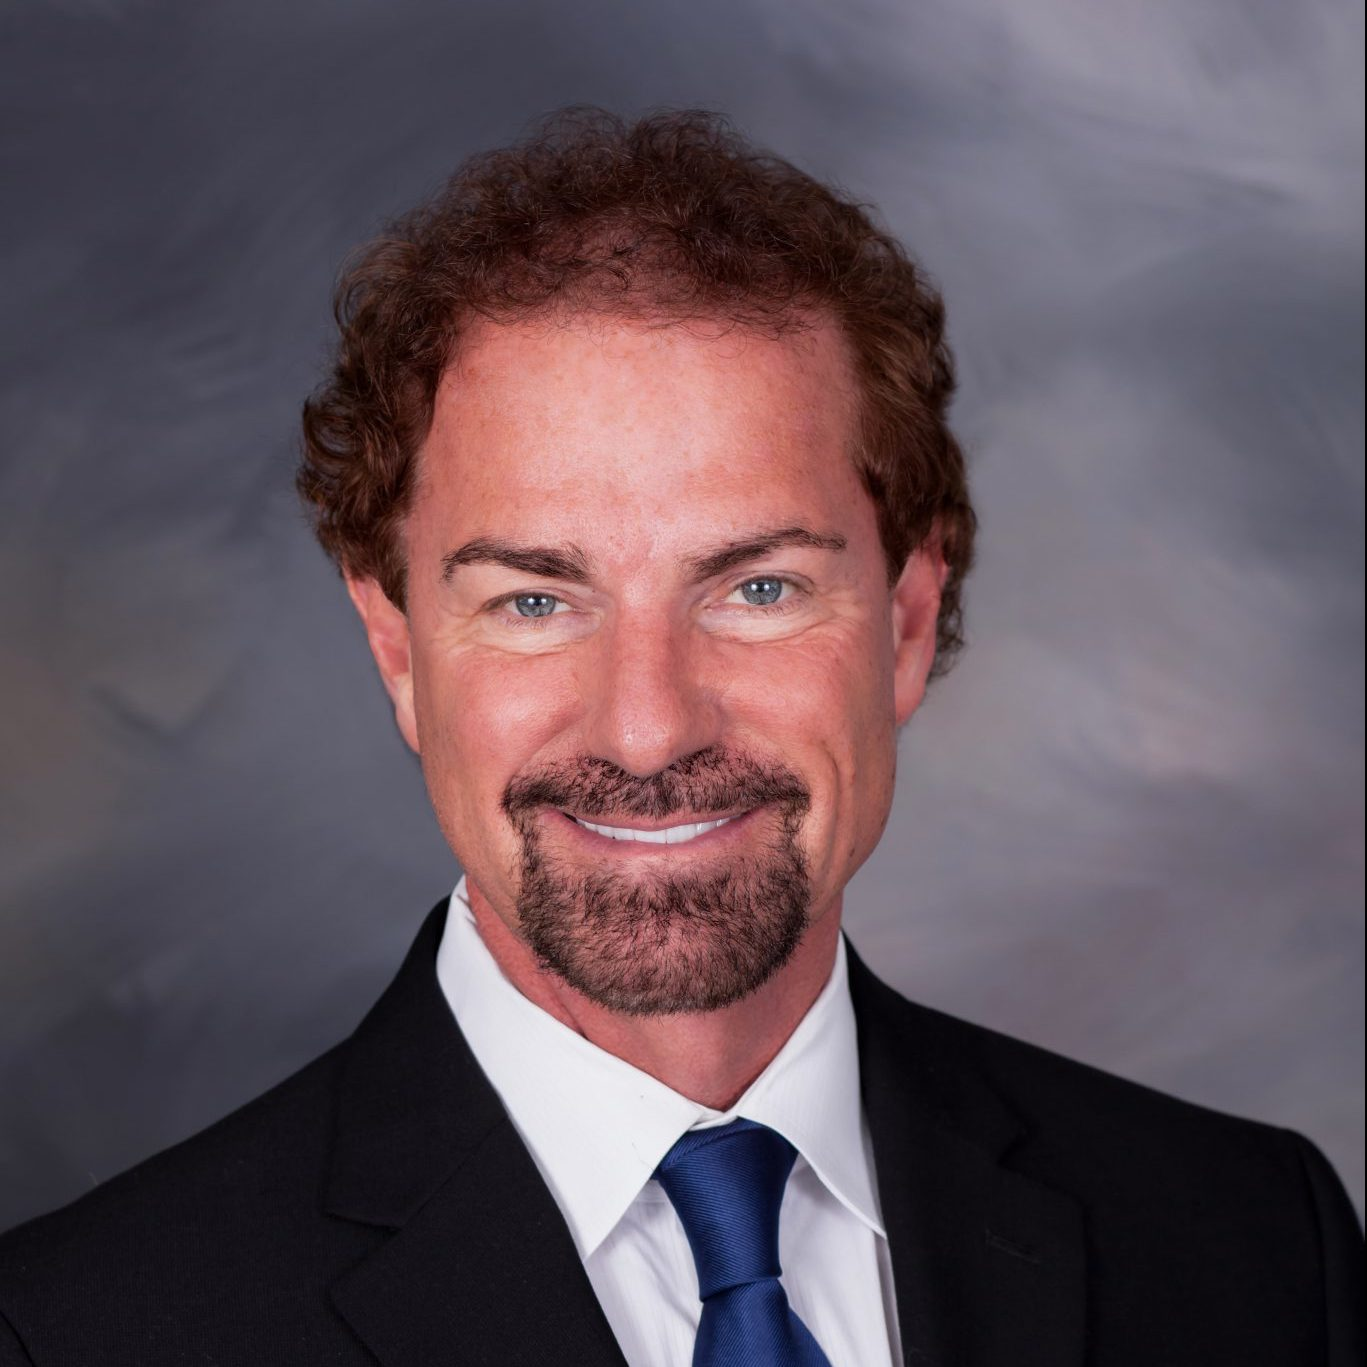 Image of Jeffrey R. Pyne, D.O.